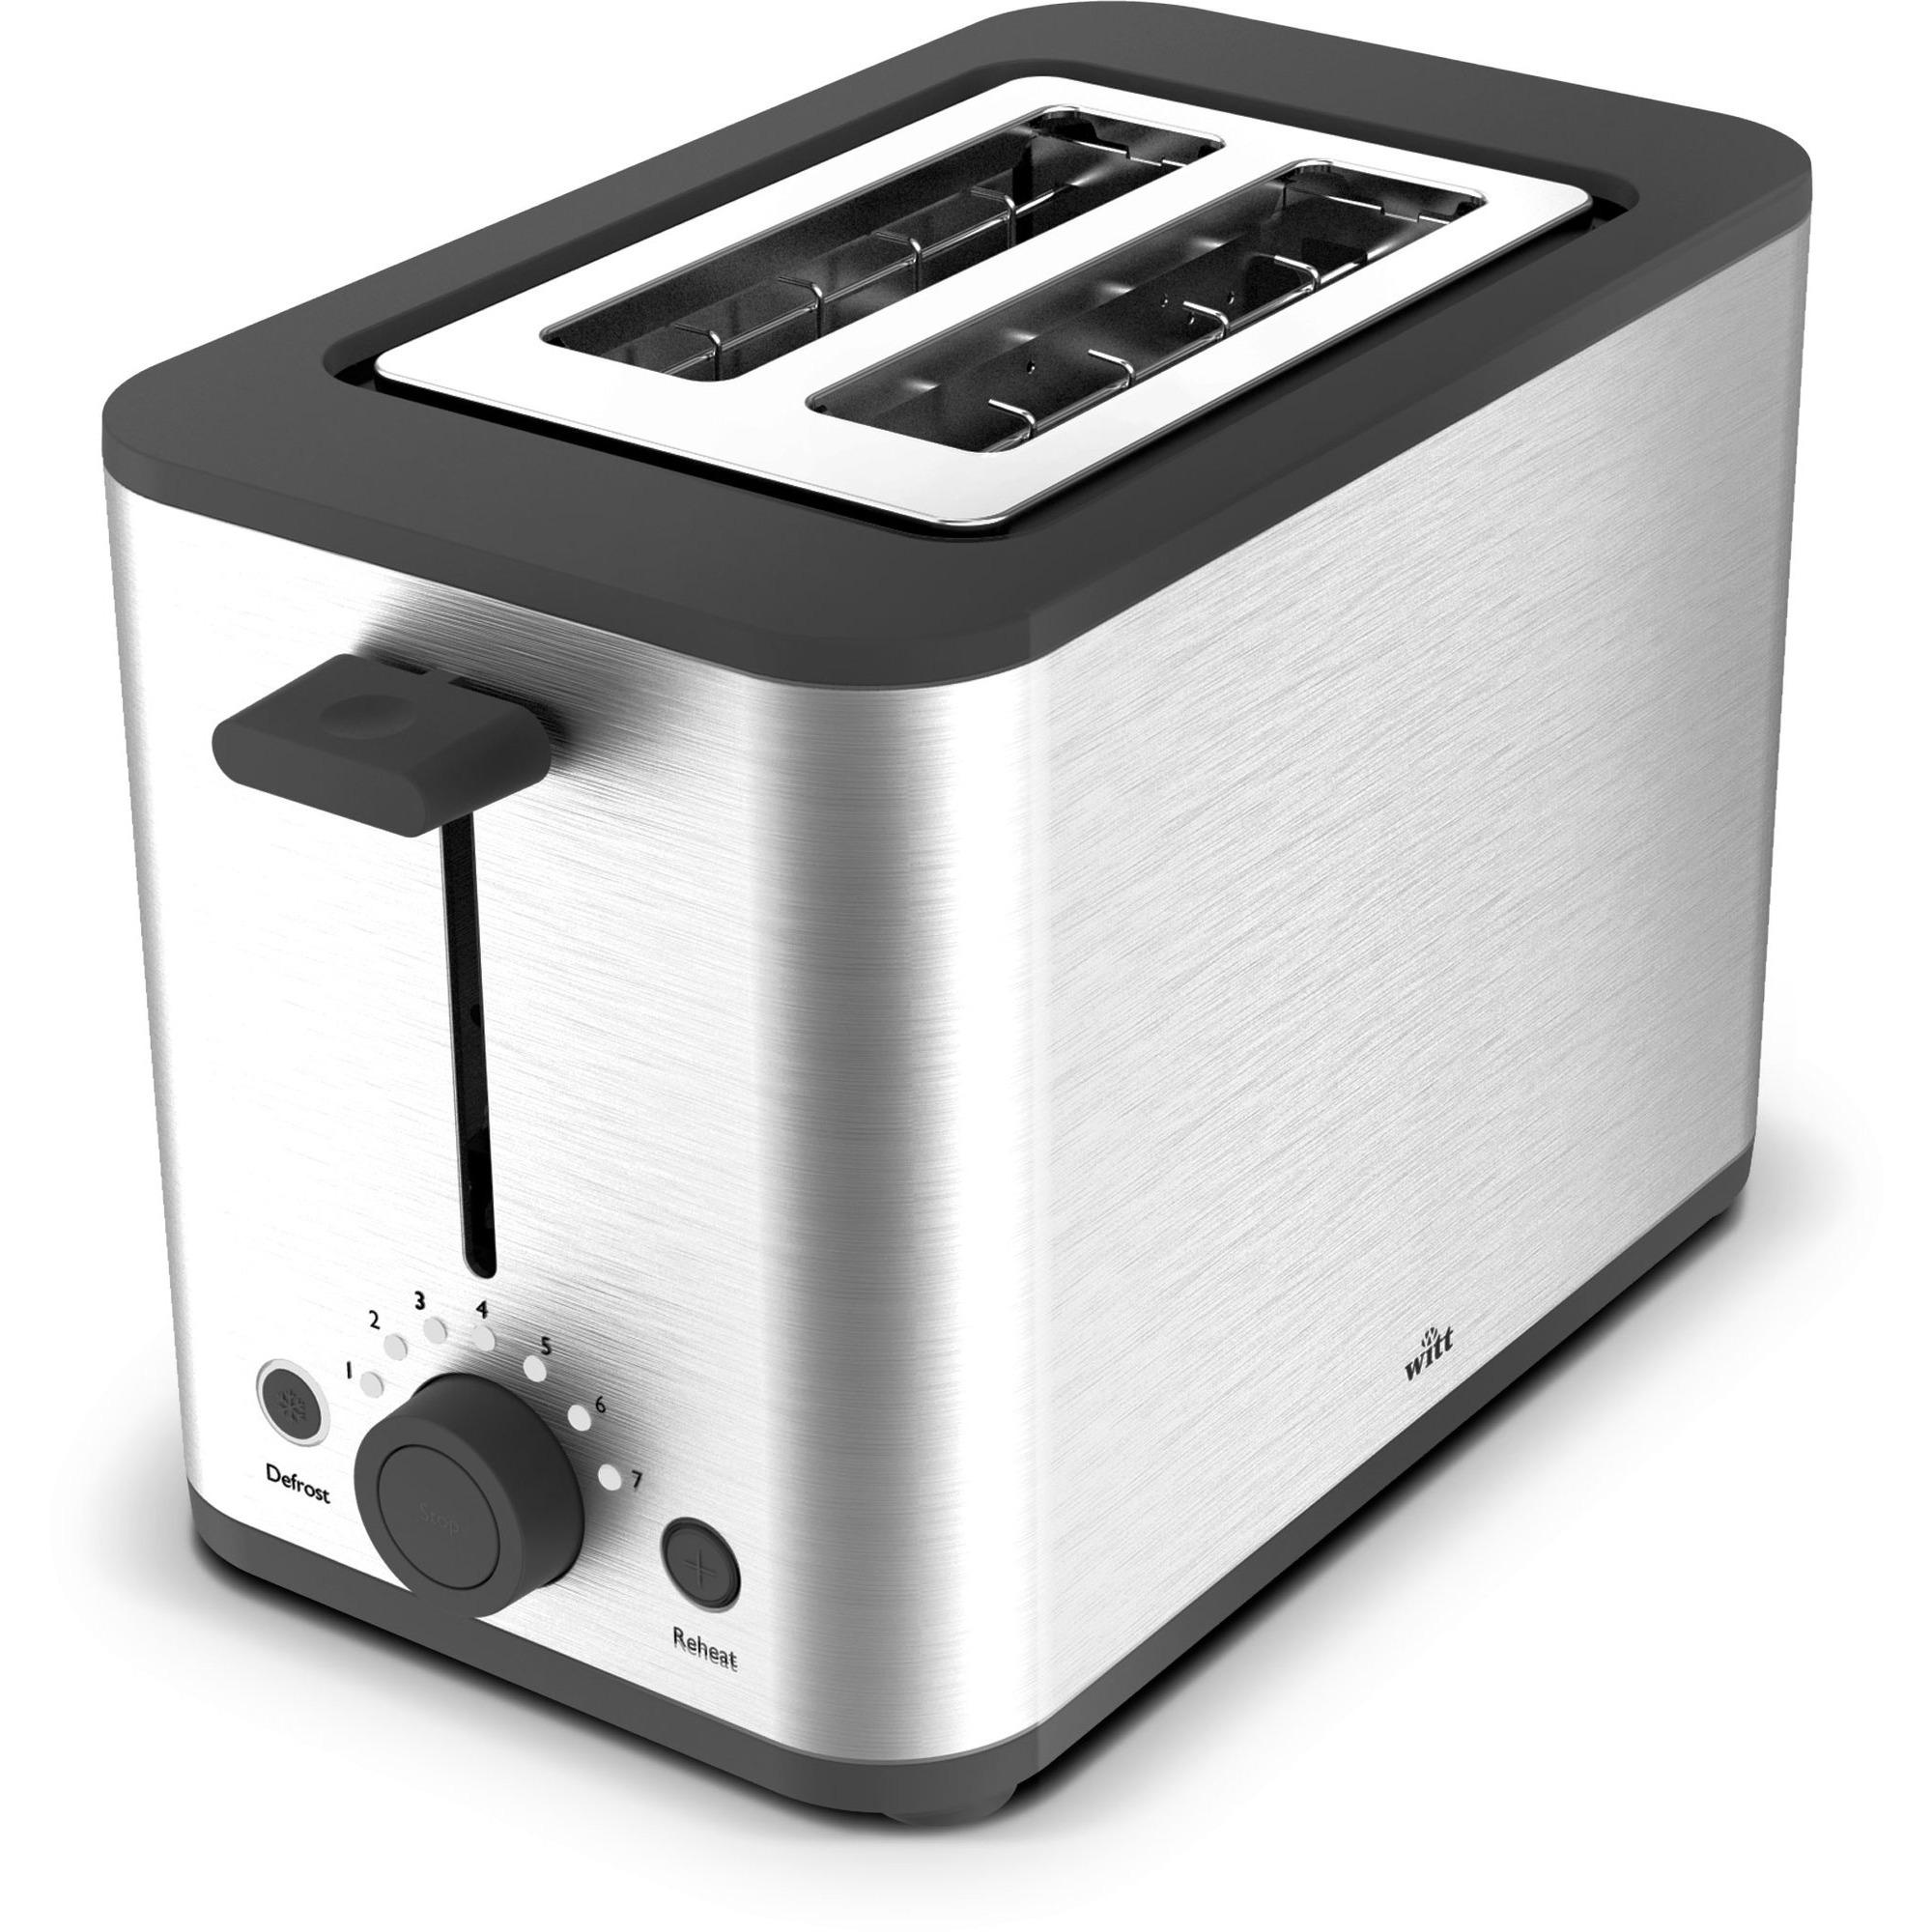 Witt Premium Toaster Rostfritt stål